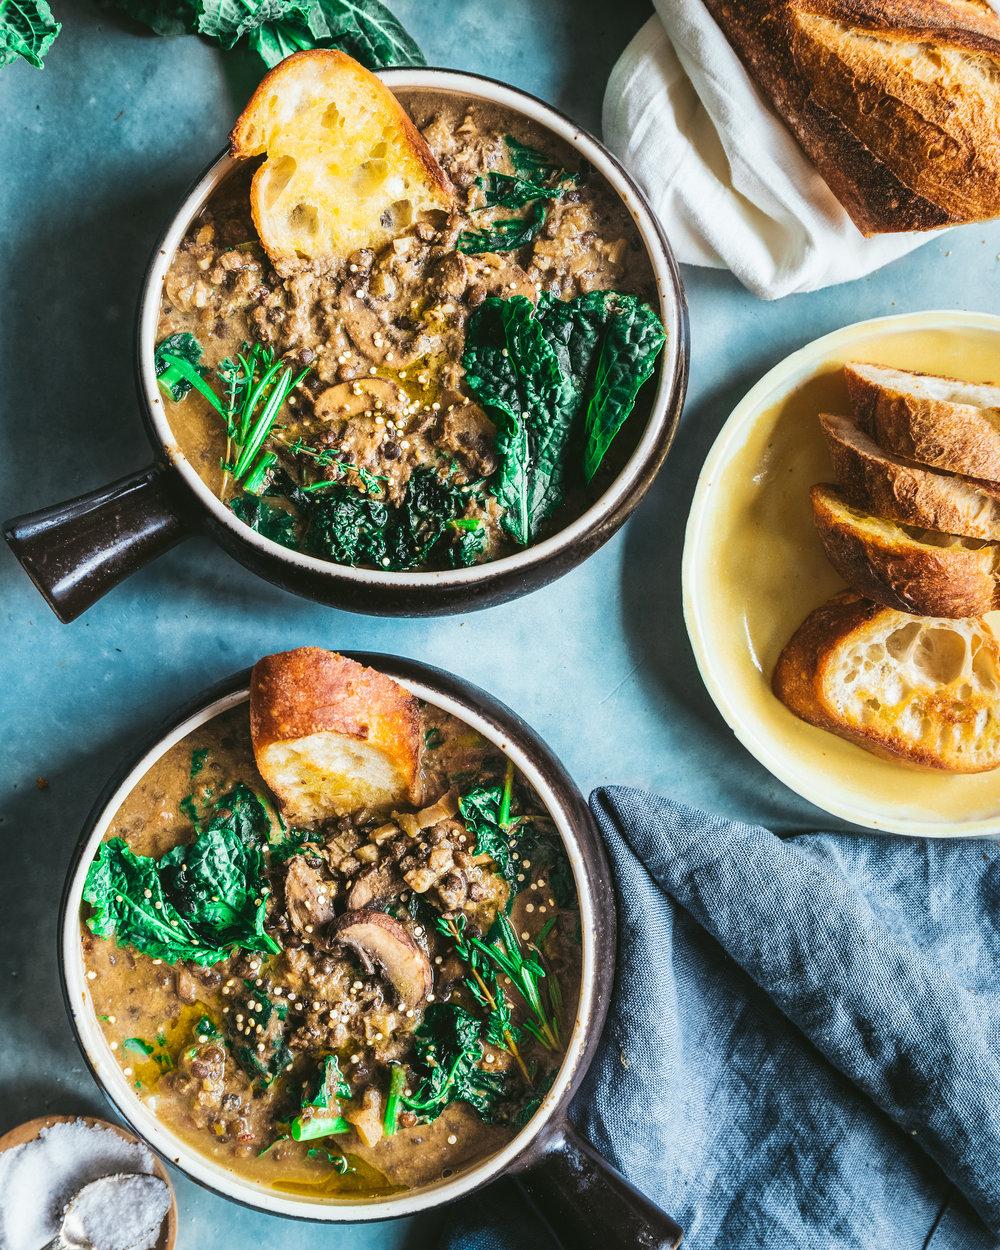 Creamy Mushroom and Black Beluga Lentil Stew - V, GF